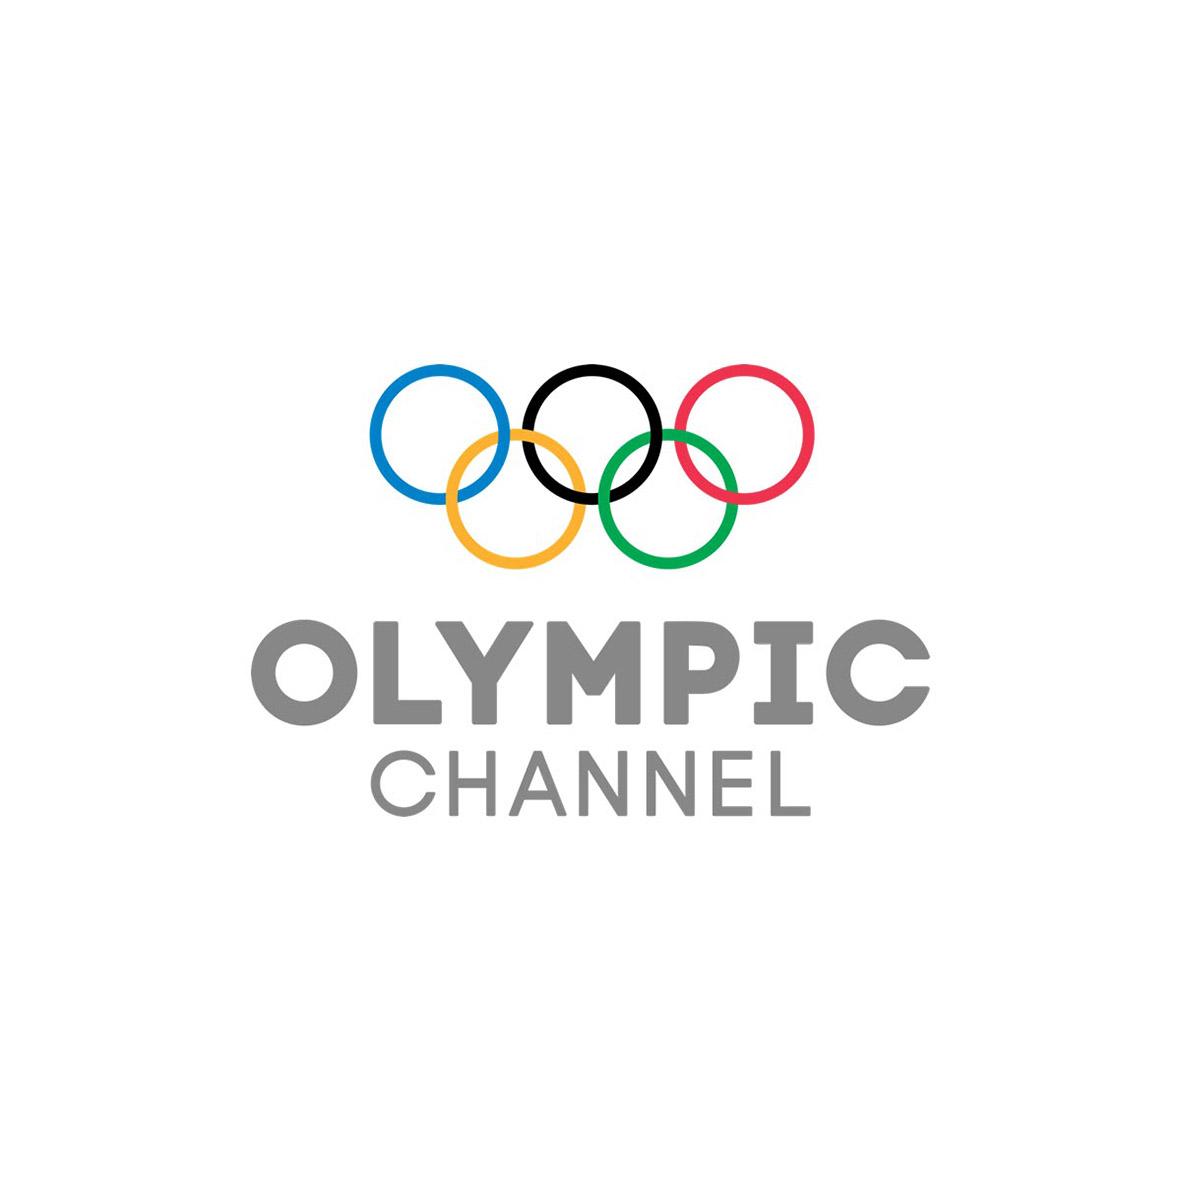 olympic channel.jpg